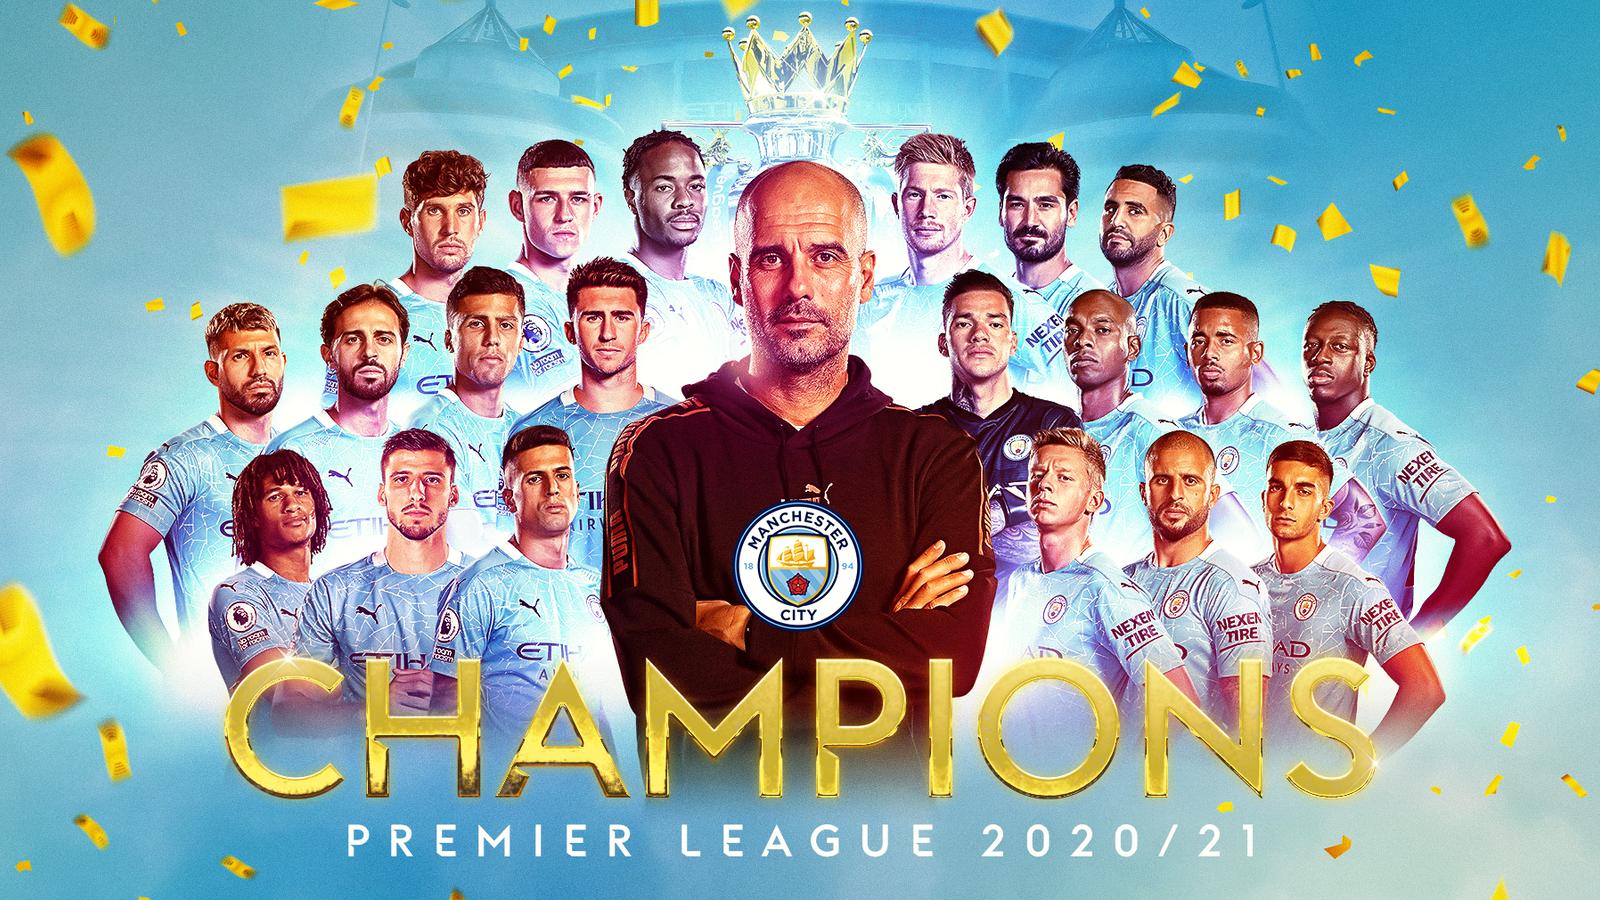 skysports man city champions 5377680 png?20210511104341